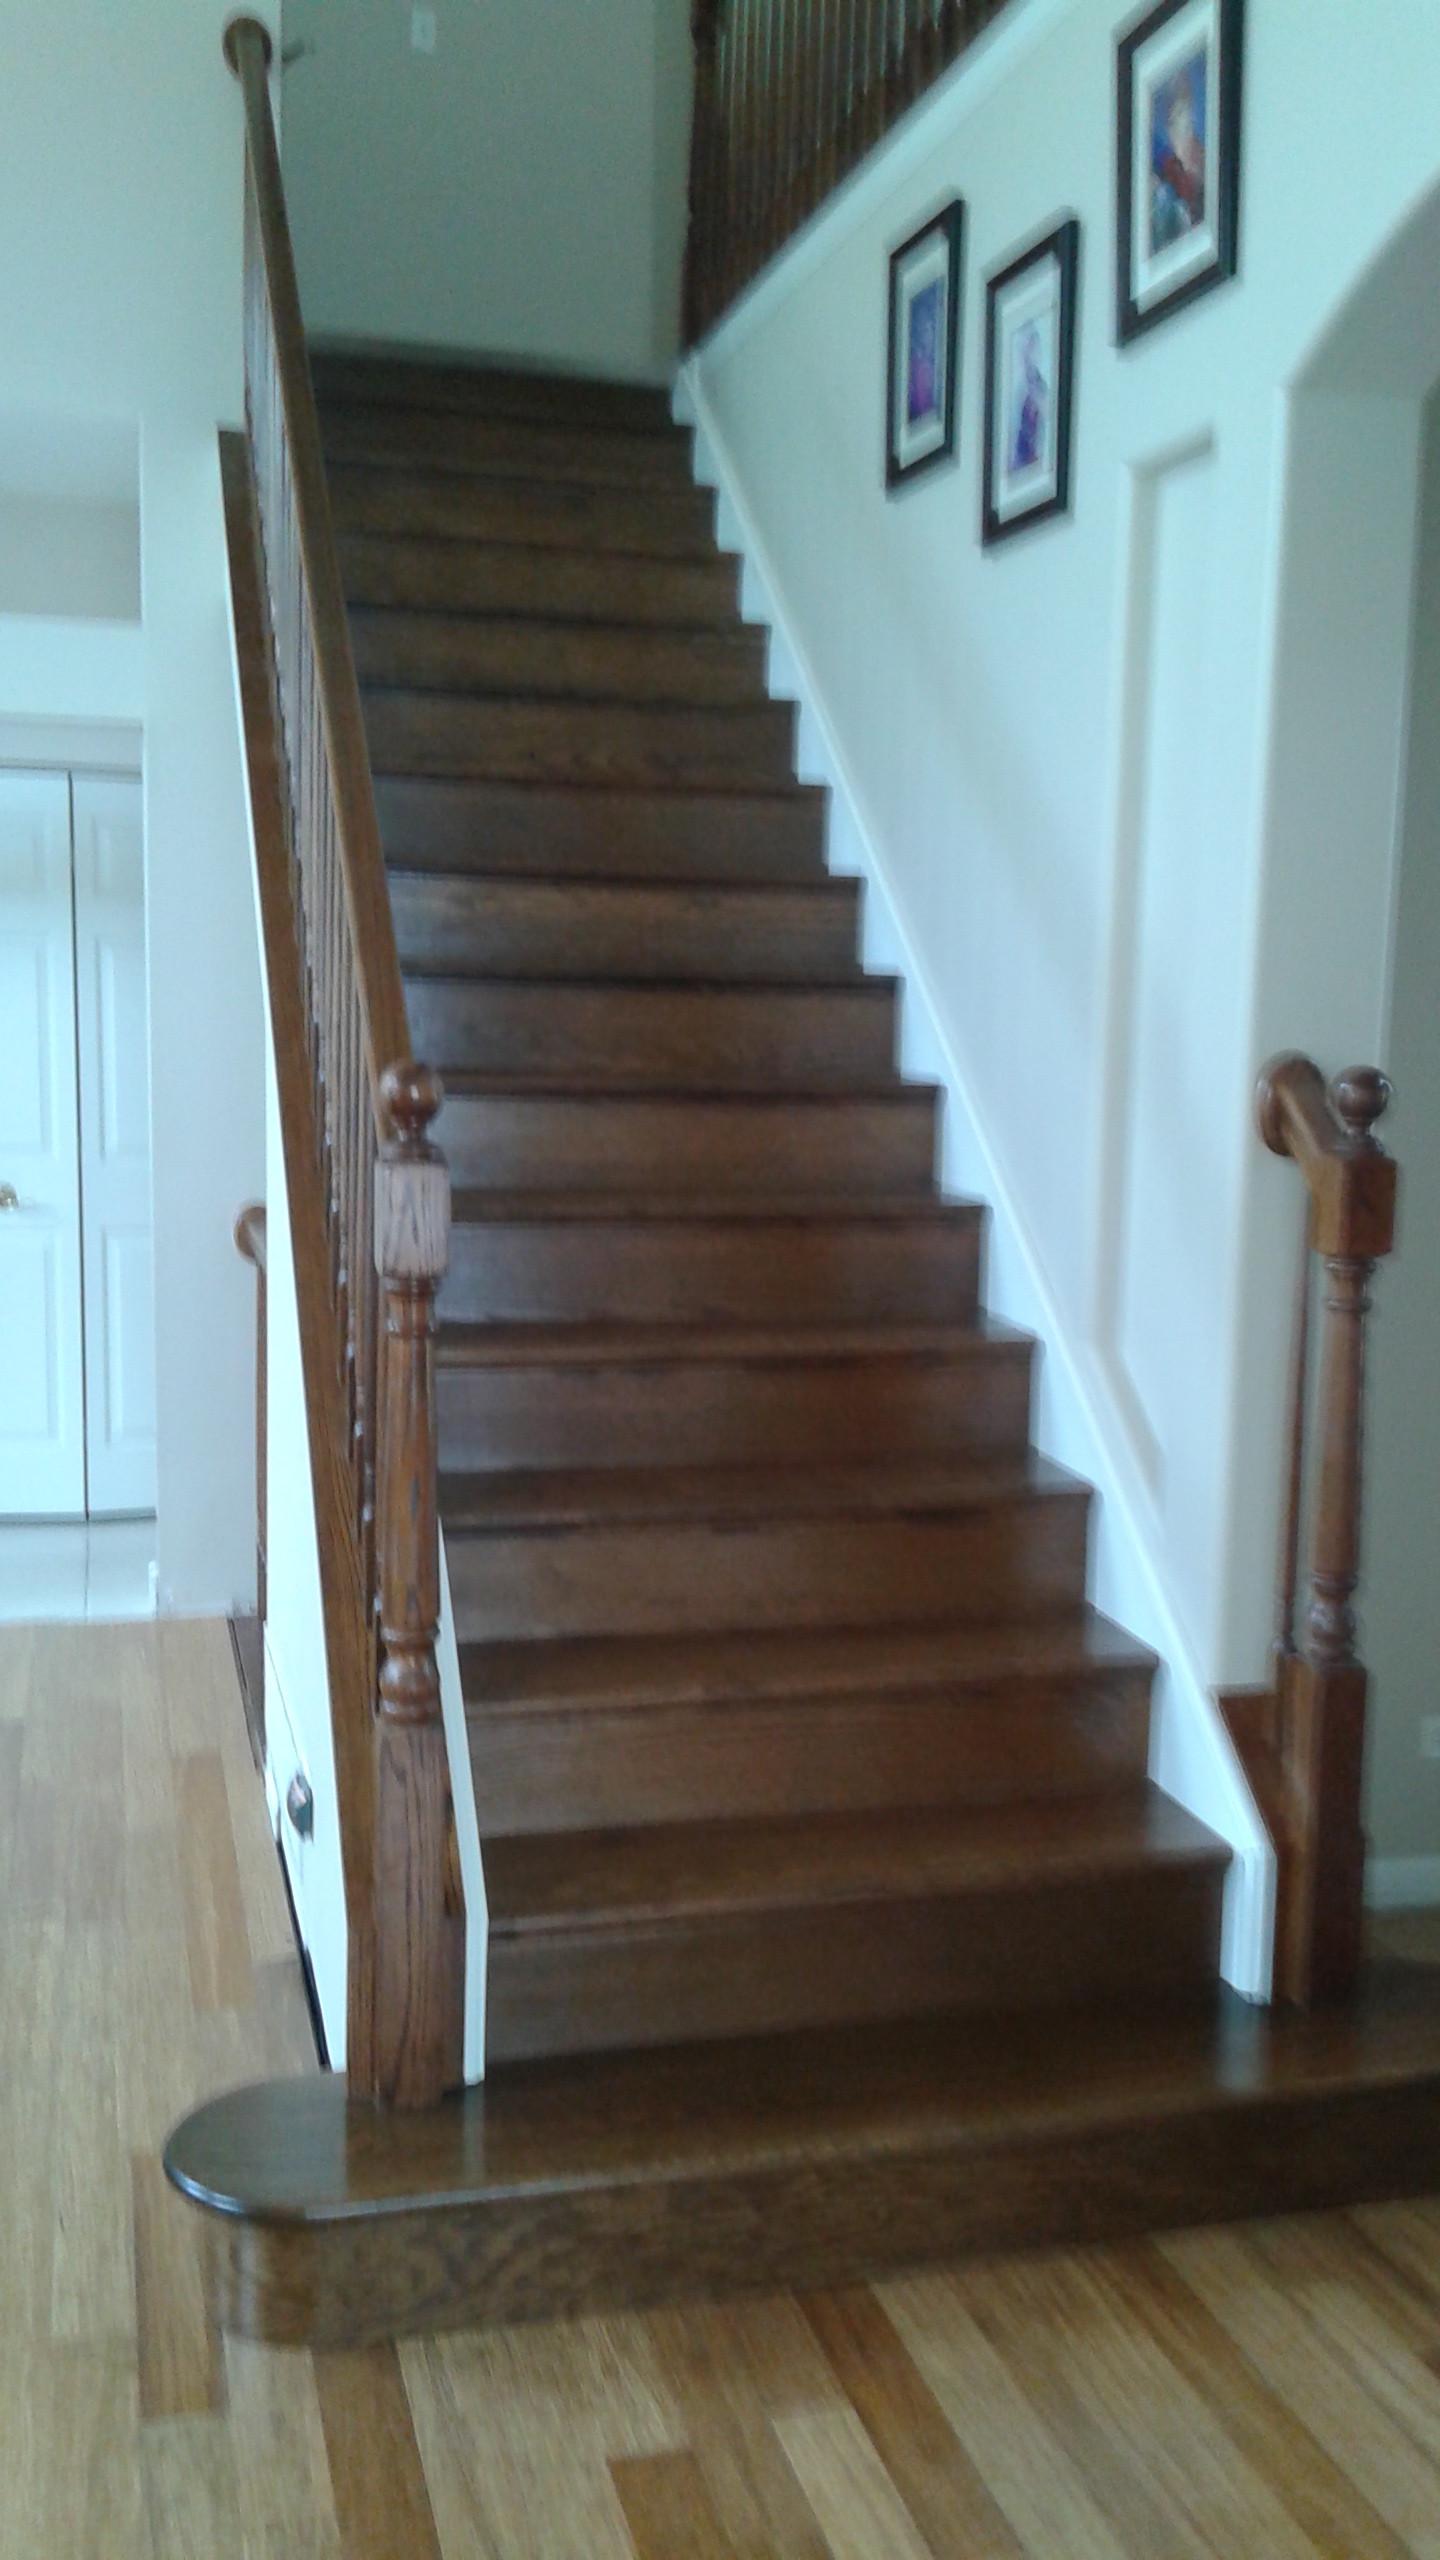 Stair Treads, Risers, and Landing Treadbox